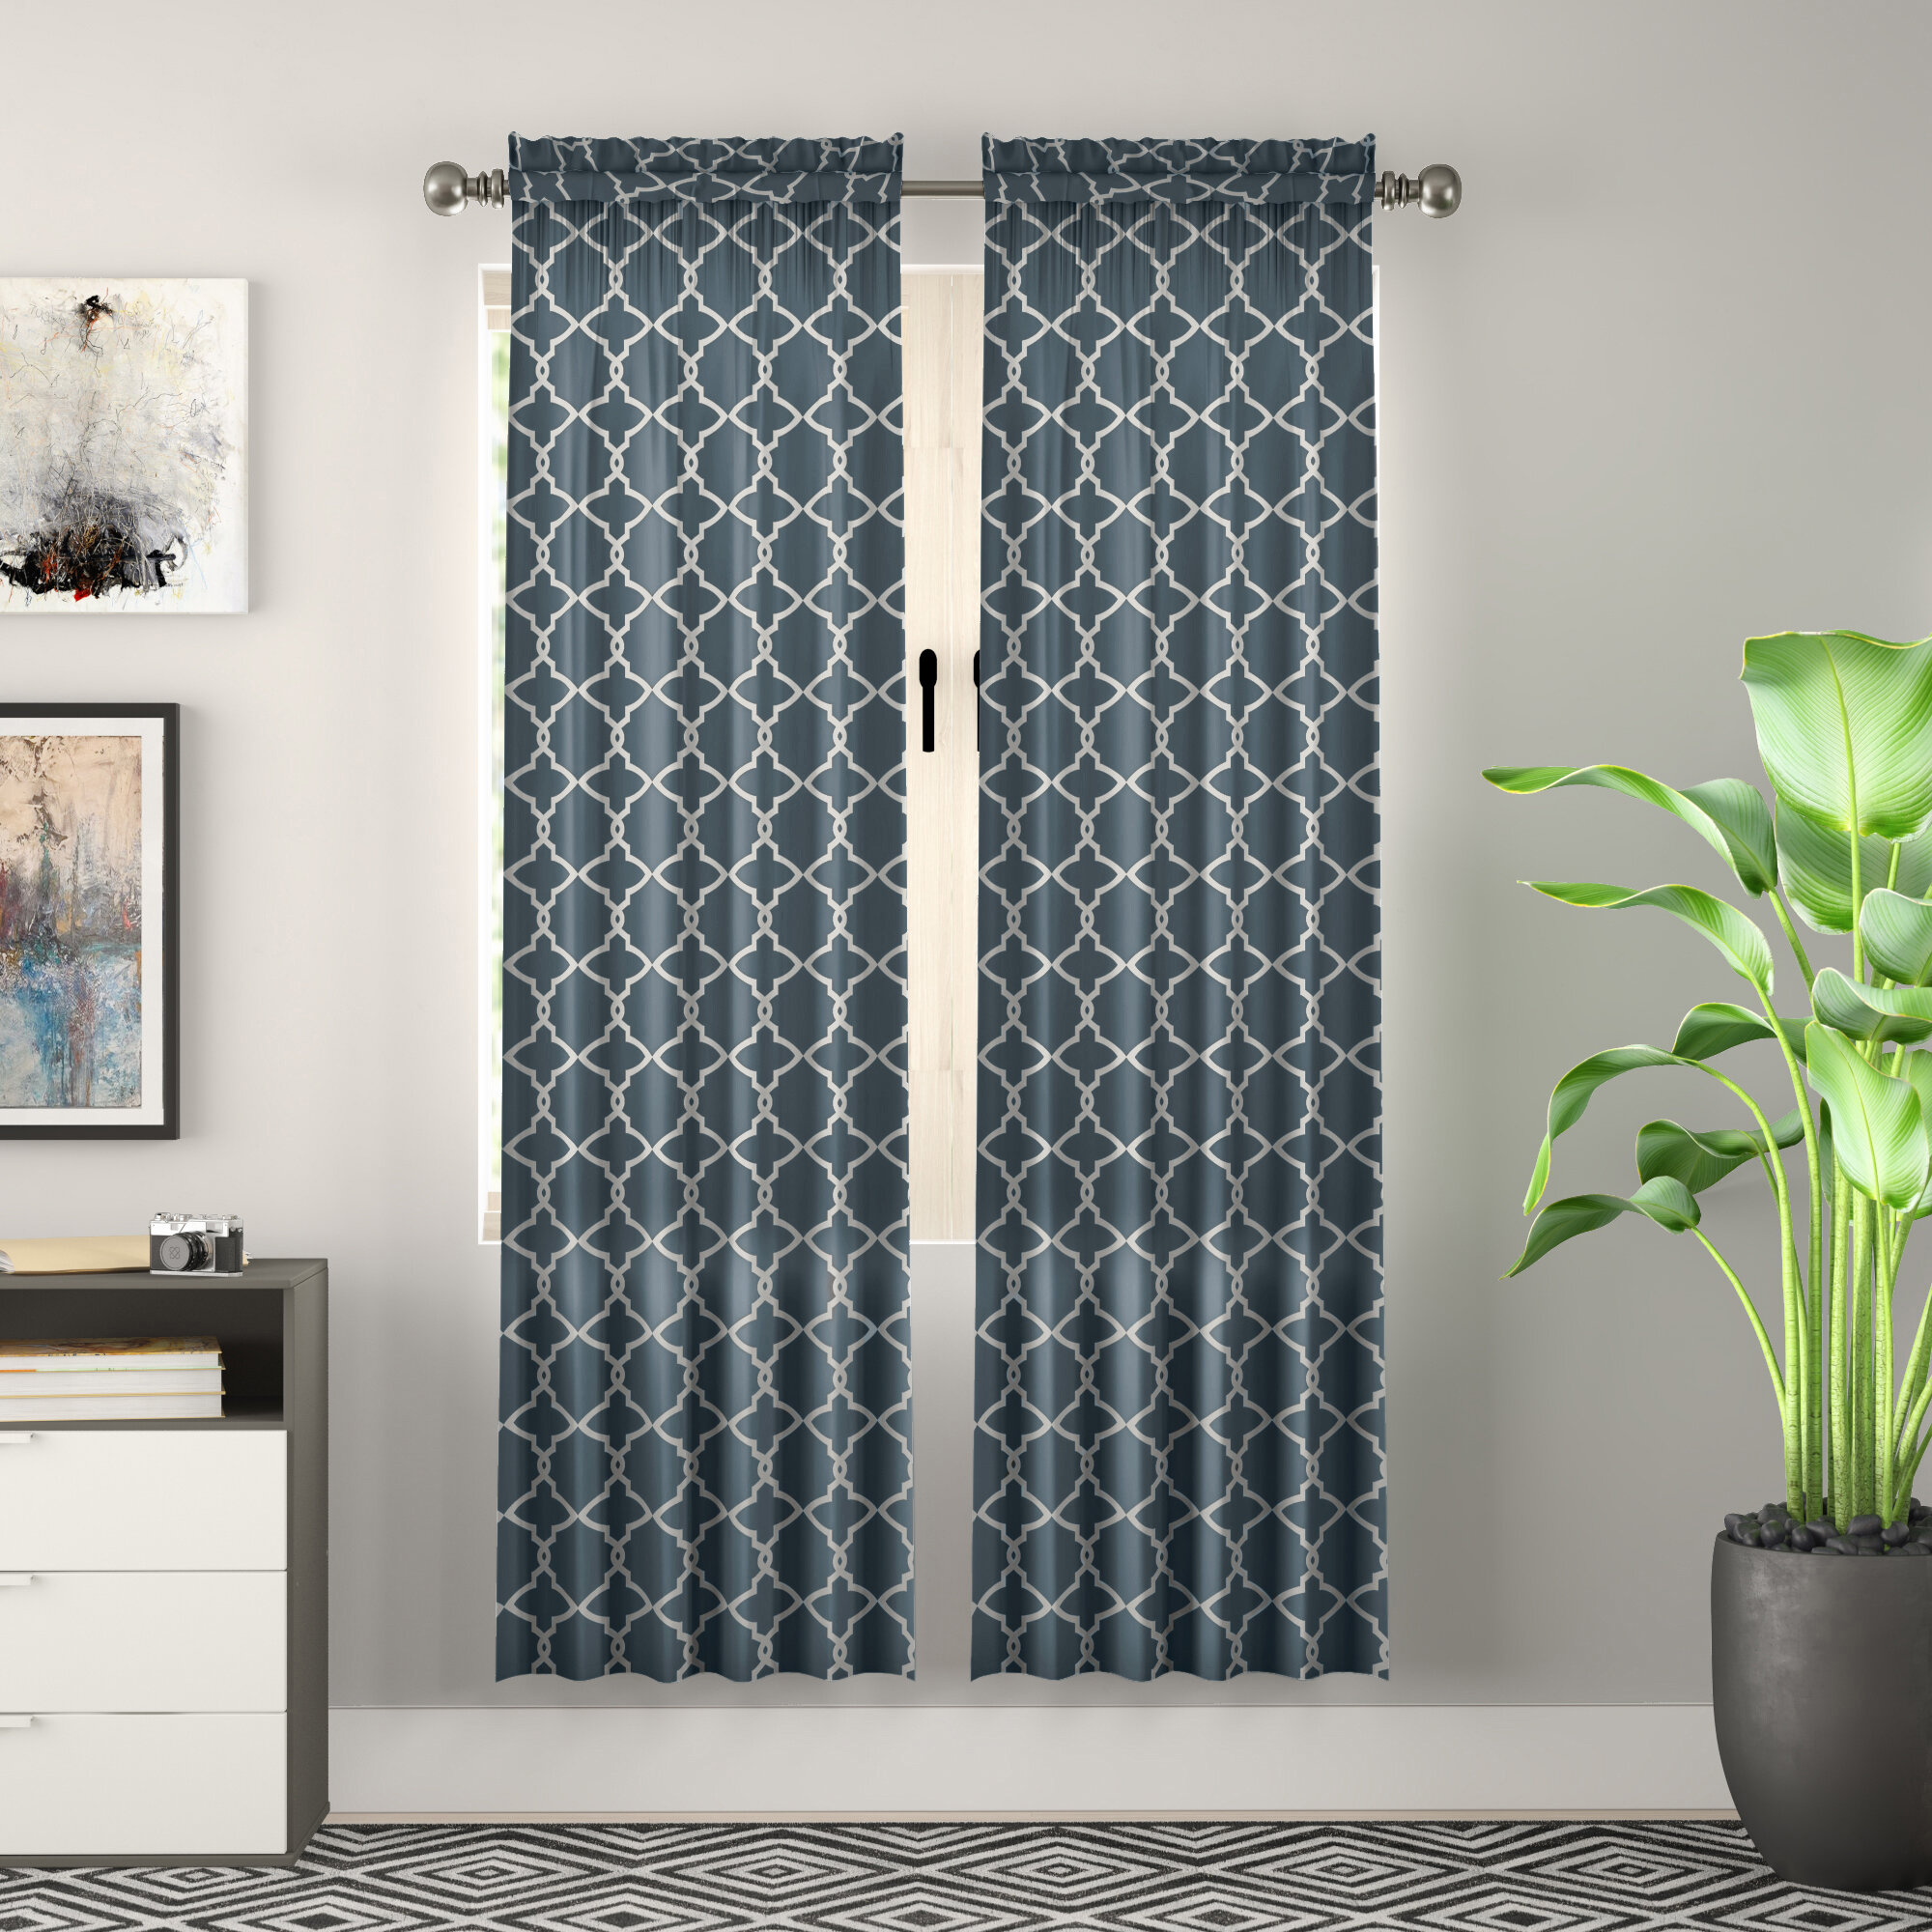 Wayfair Room Darkening Curtains Drapes You Ll Love In 2021